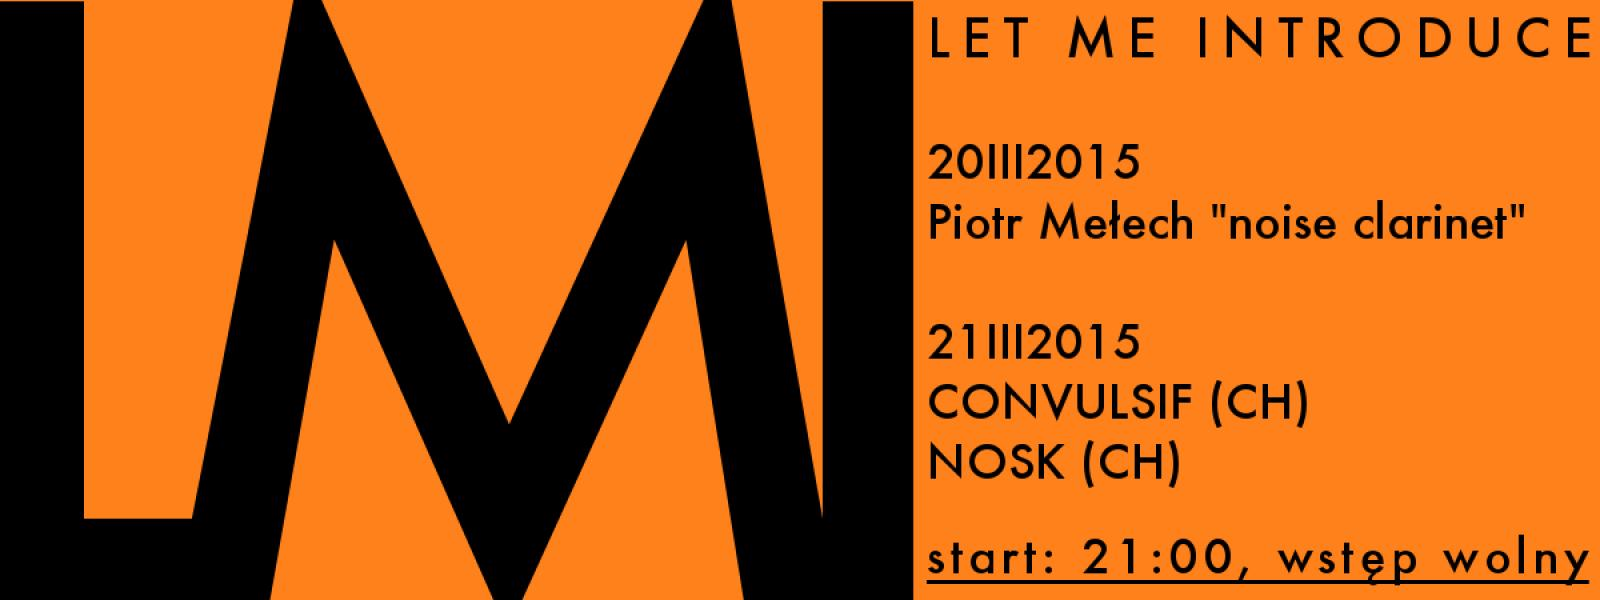 LNOSK + CONVULSIF